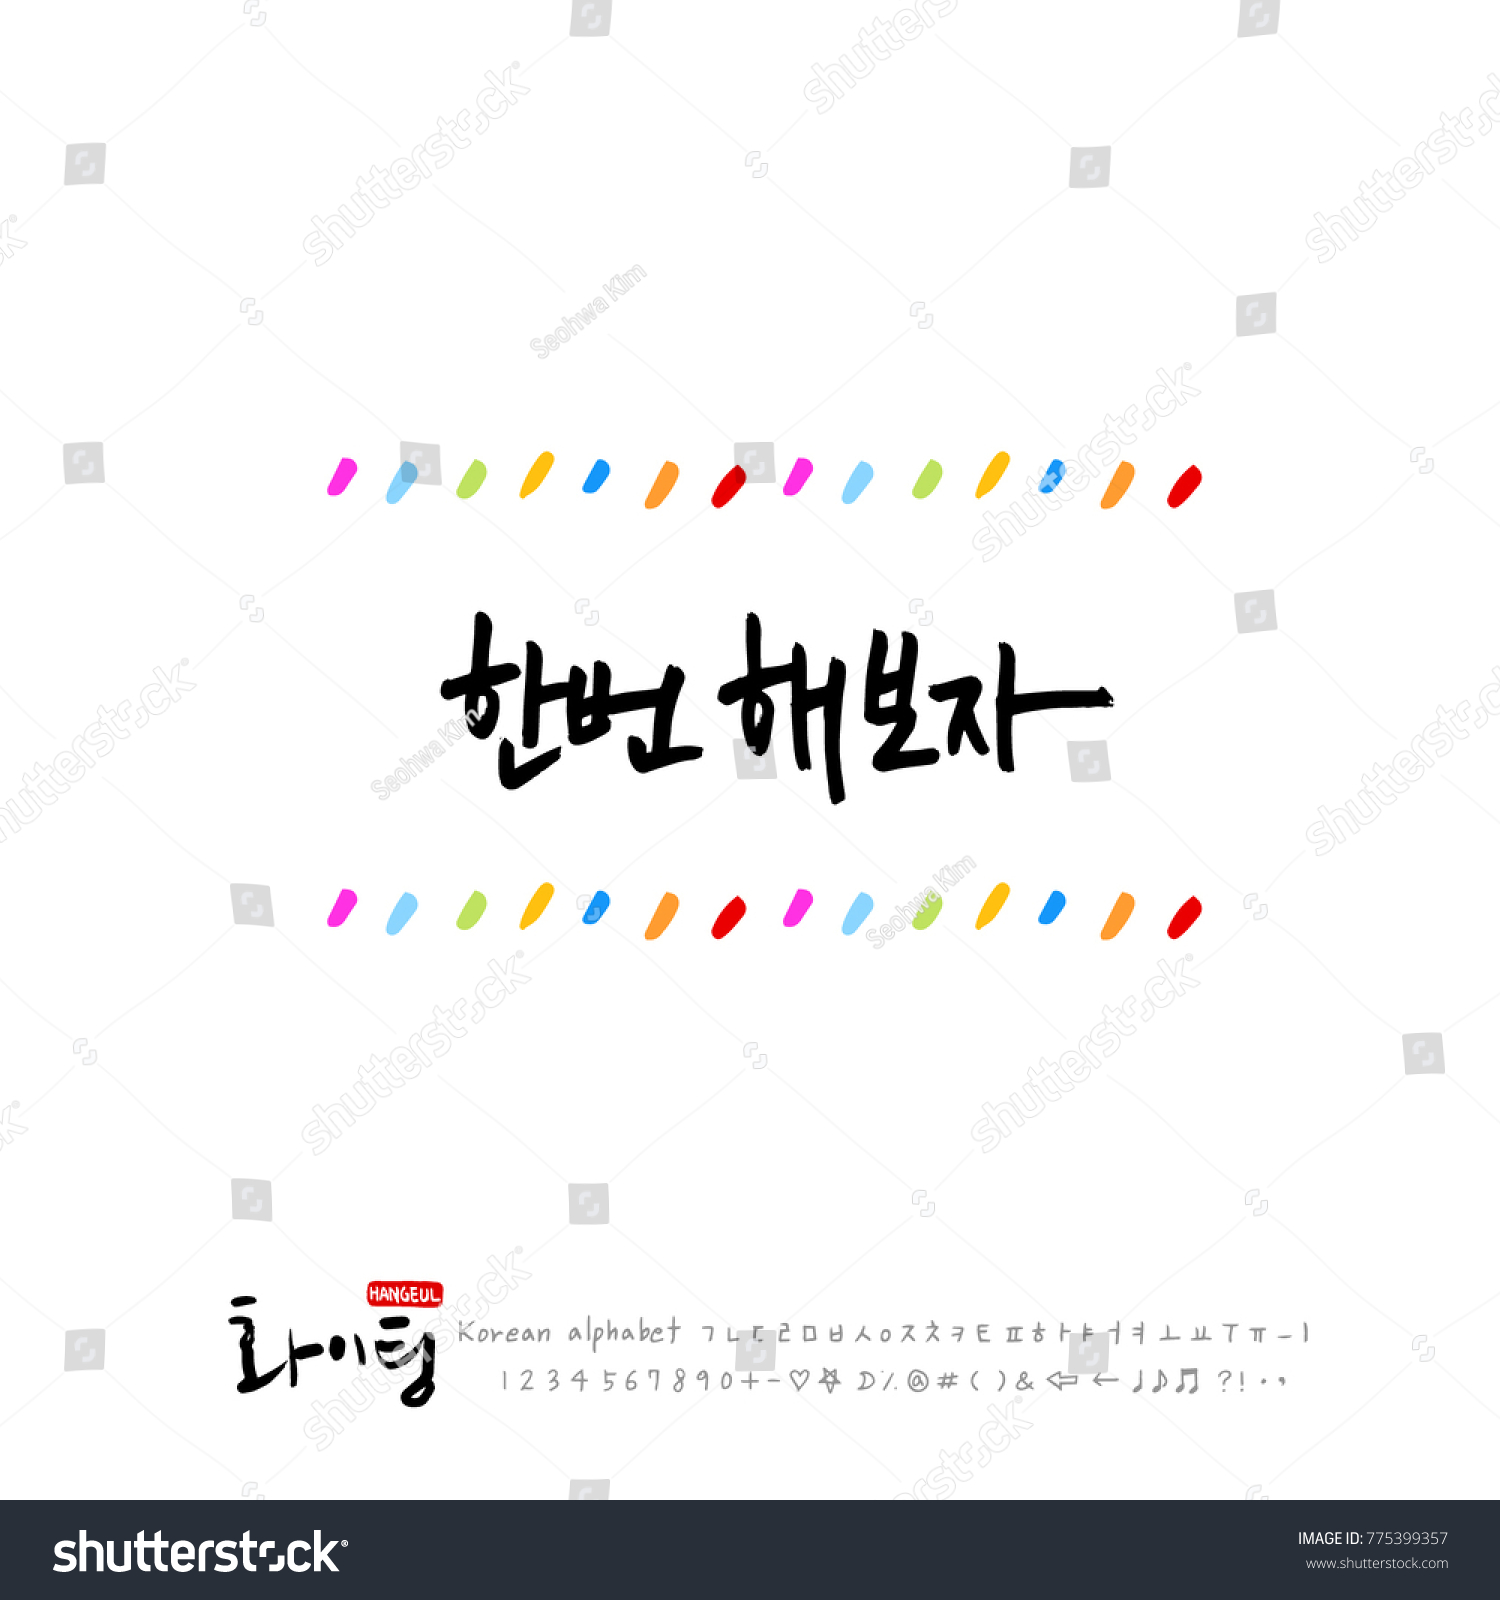 Handwritten calligraphy good work korean greeting stock vector handwritten calligraphy good work korean greeting stock vector 775399357 shutterstock m4hsunfo